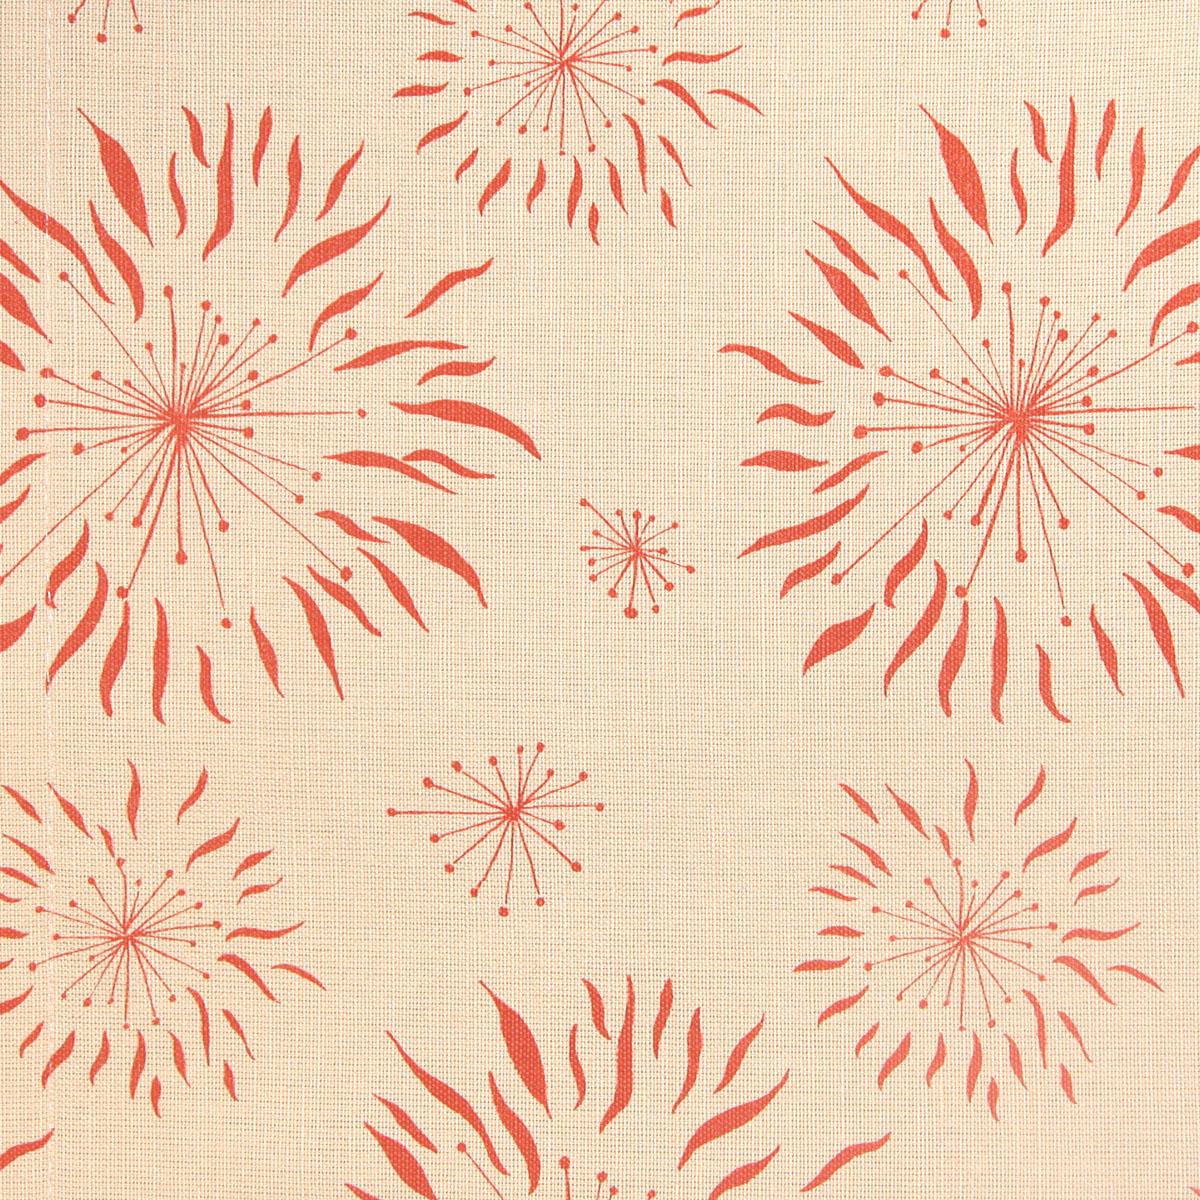 Dandelion Cream Red